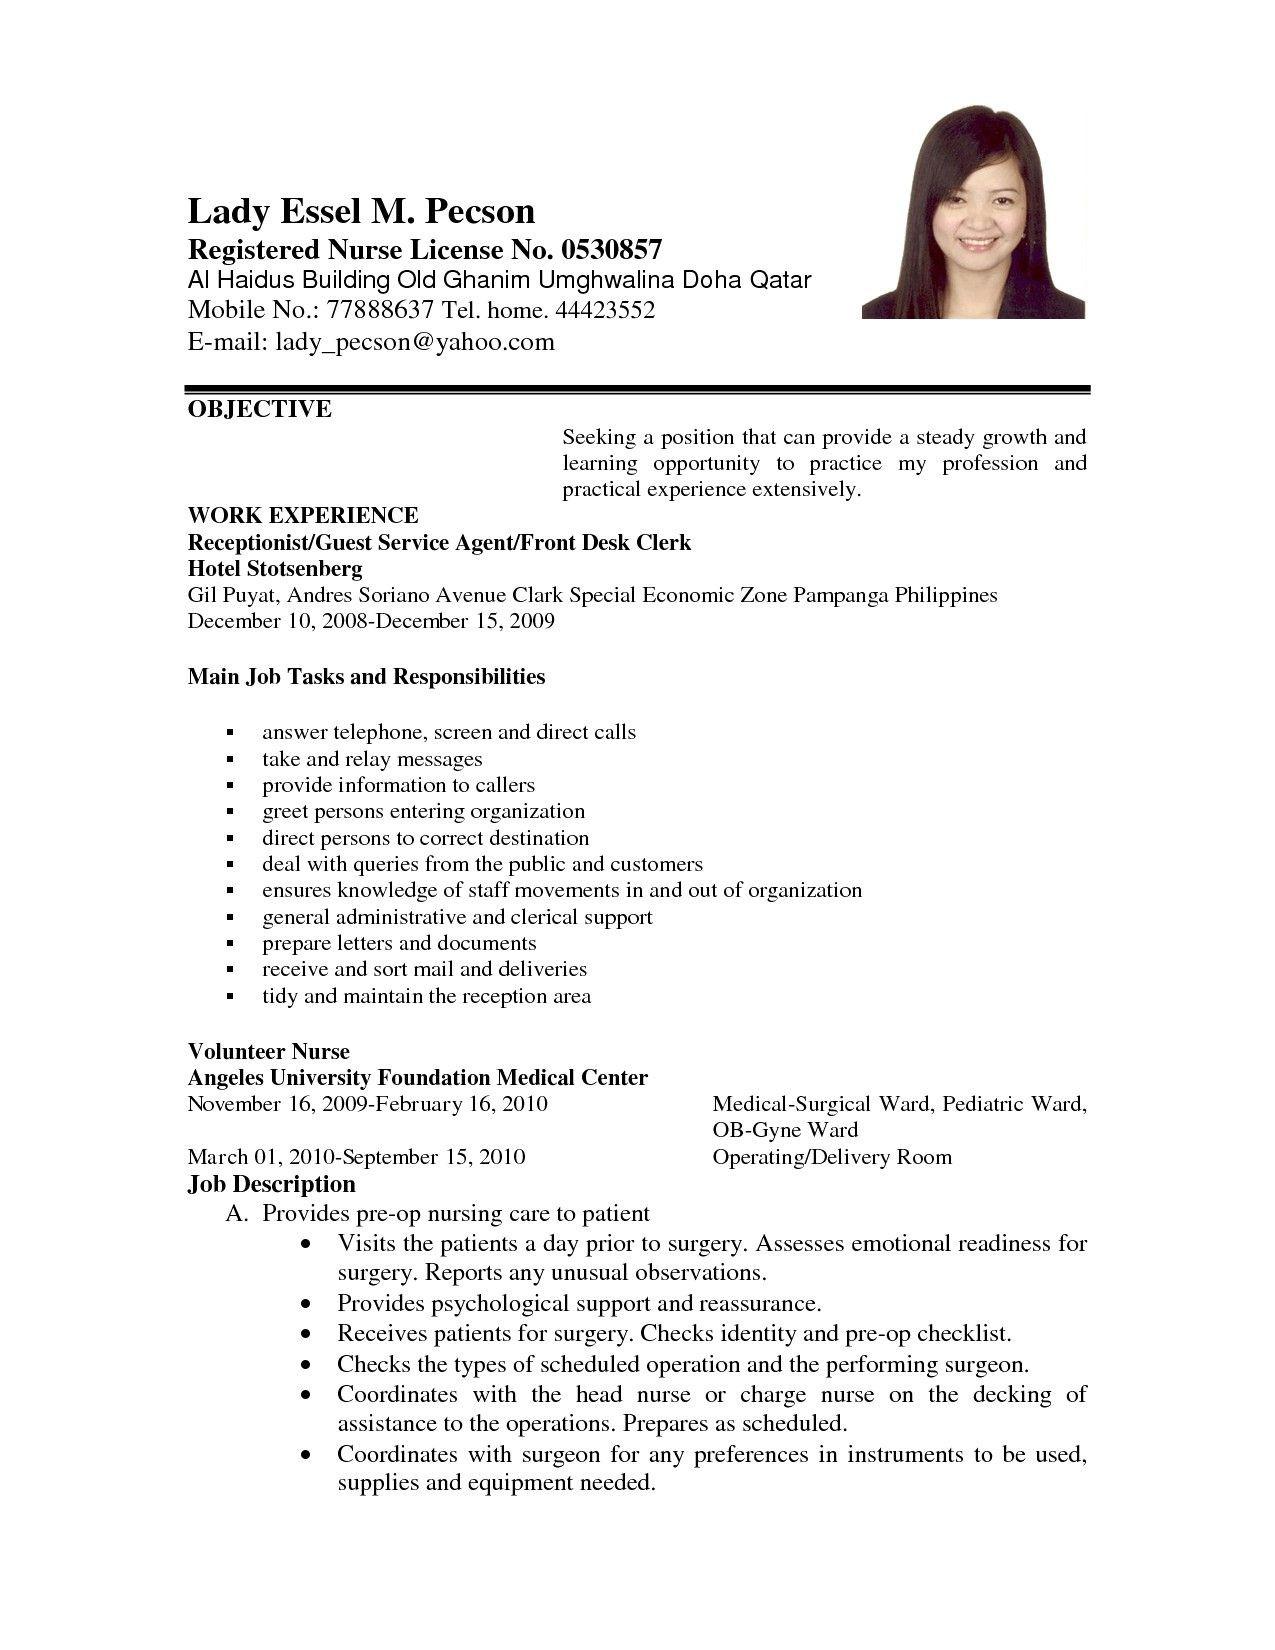 office job resume objective